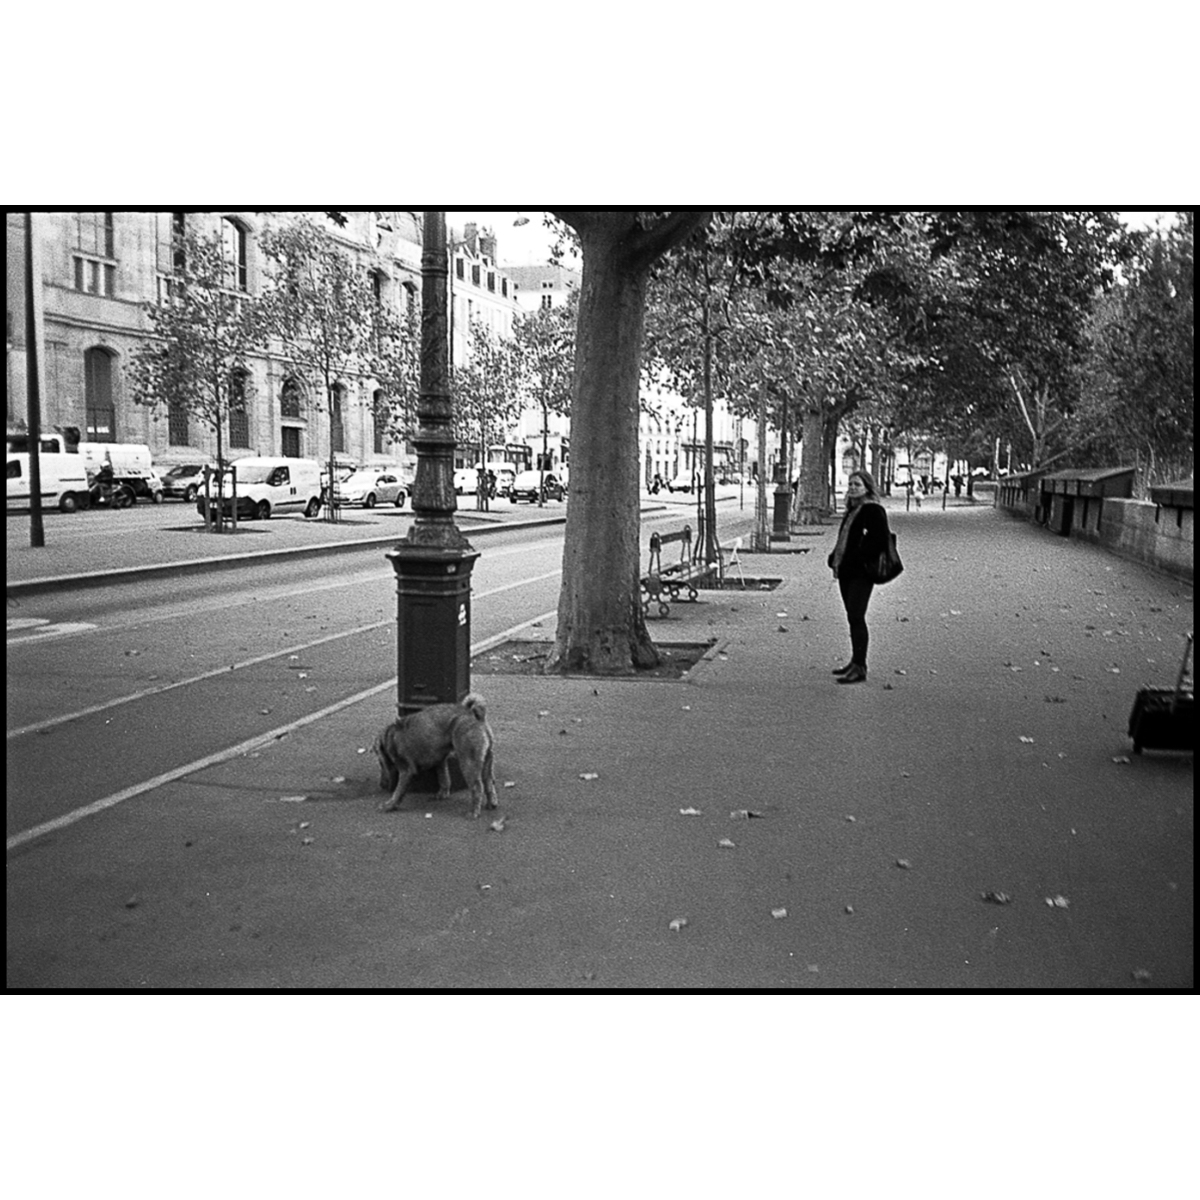 paris file-033.jpg